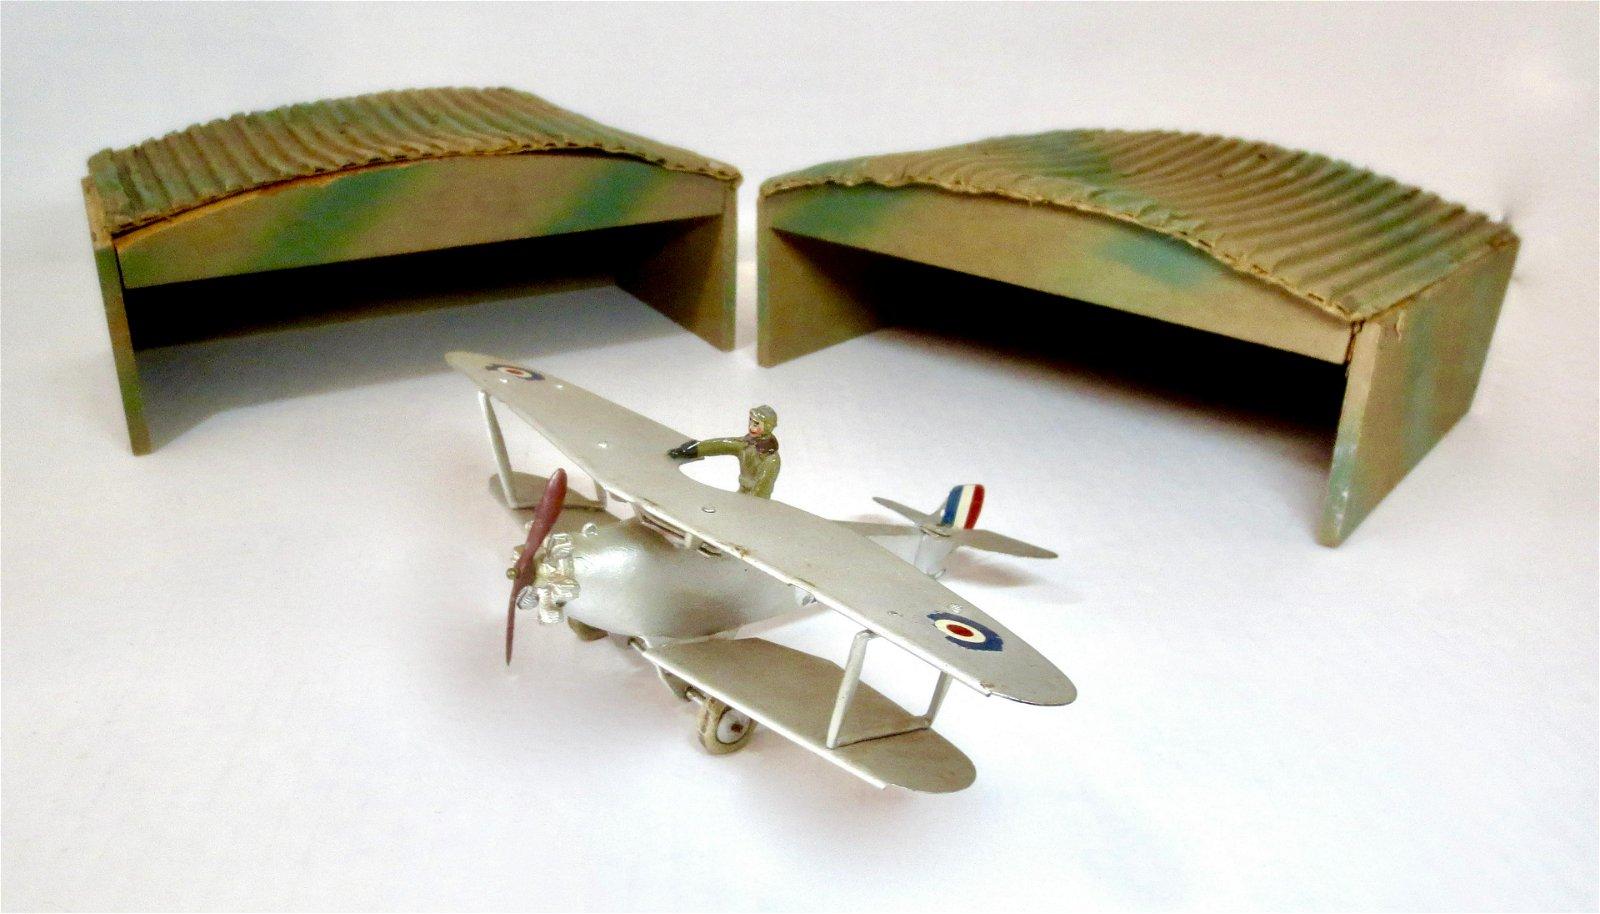 Britains #1521 VERY RARE Biplane & Hangers